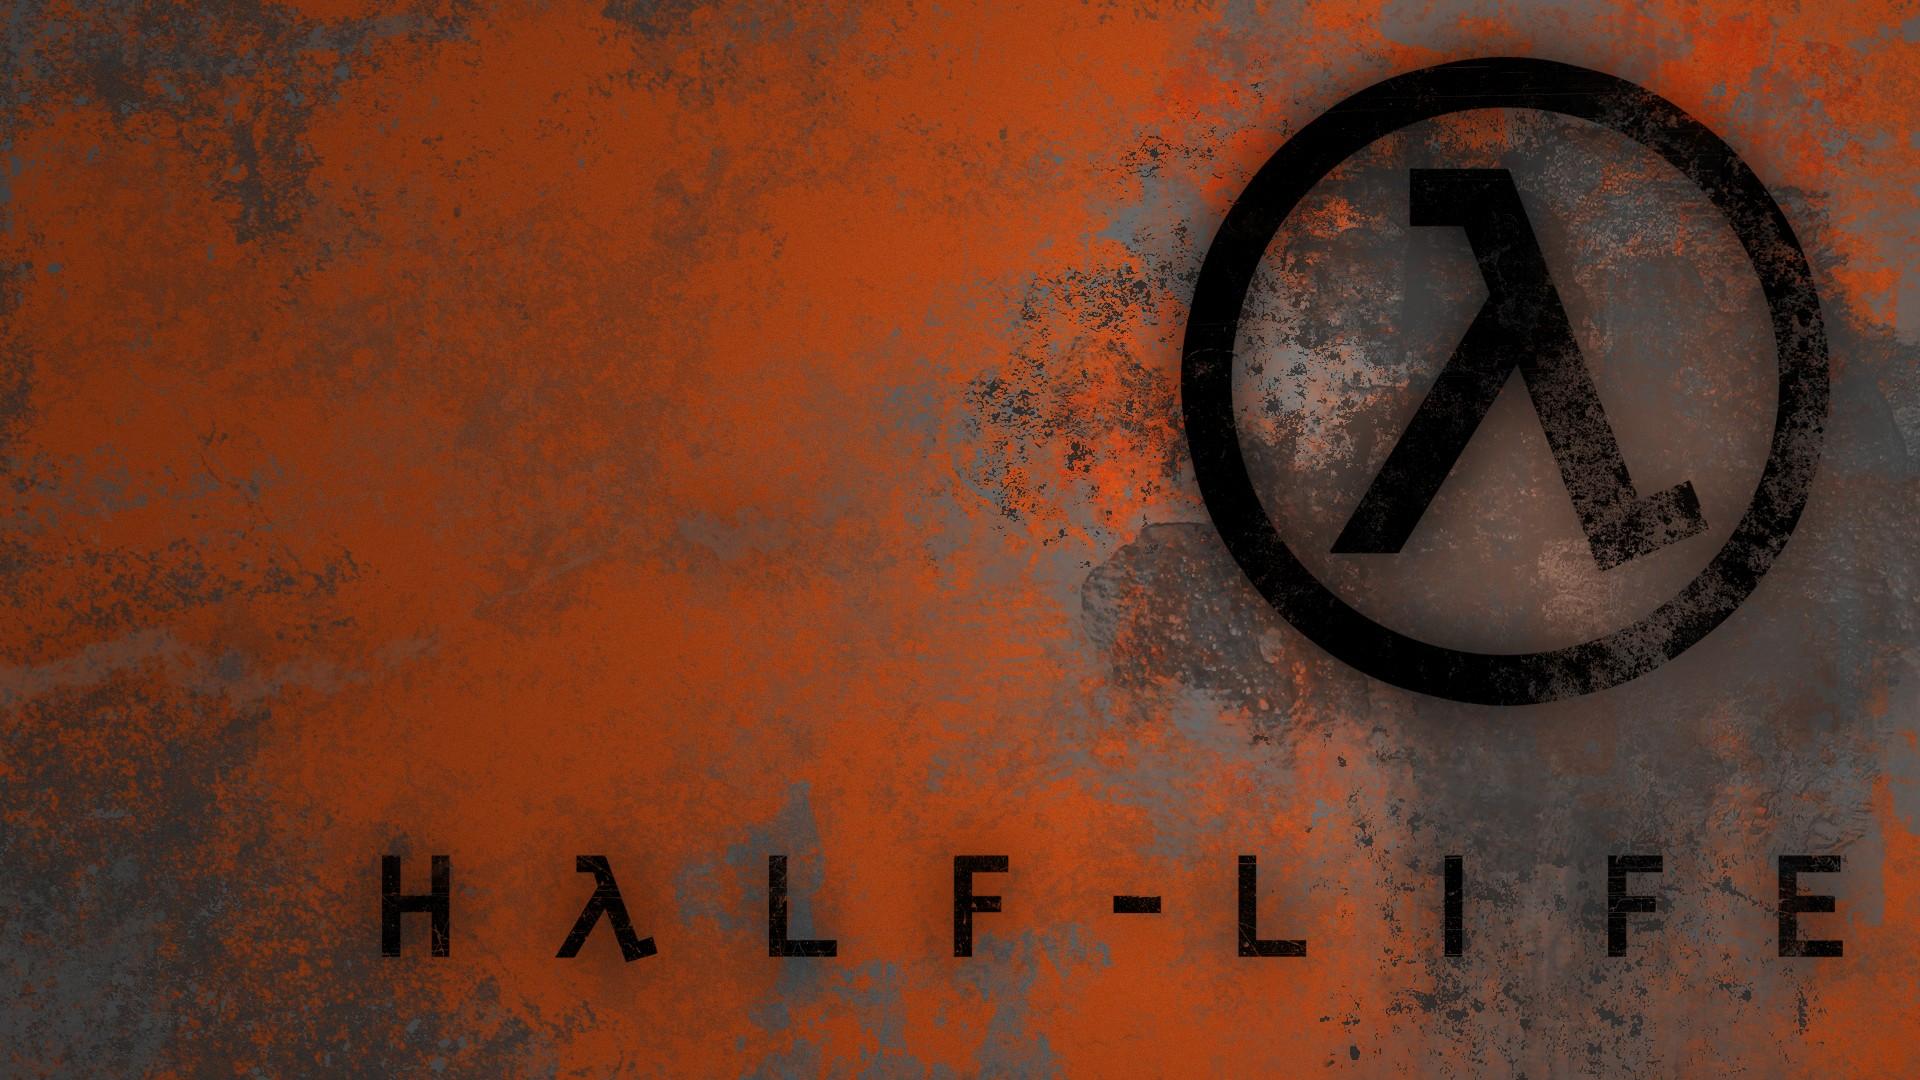 General 1920x1080 Half-Life Valve Corporation video games digital art